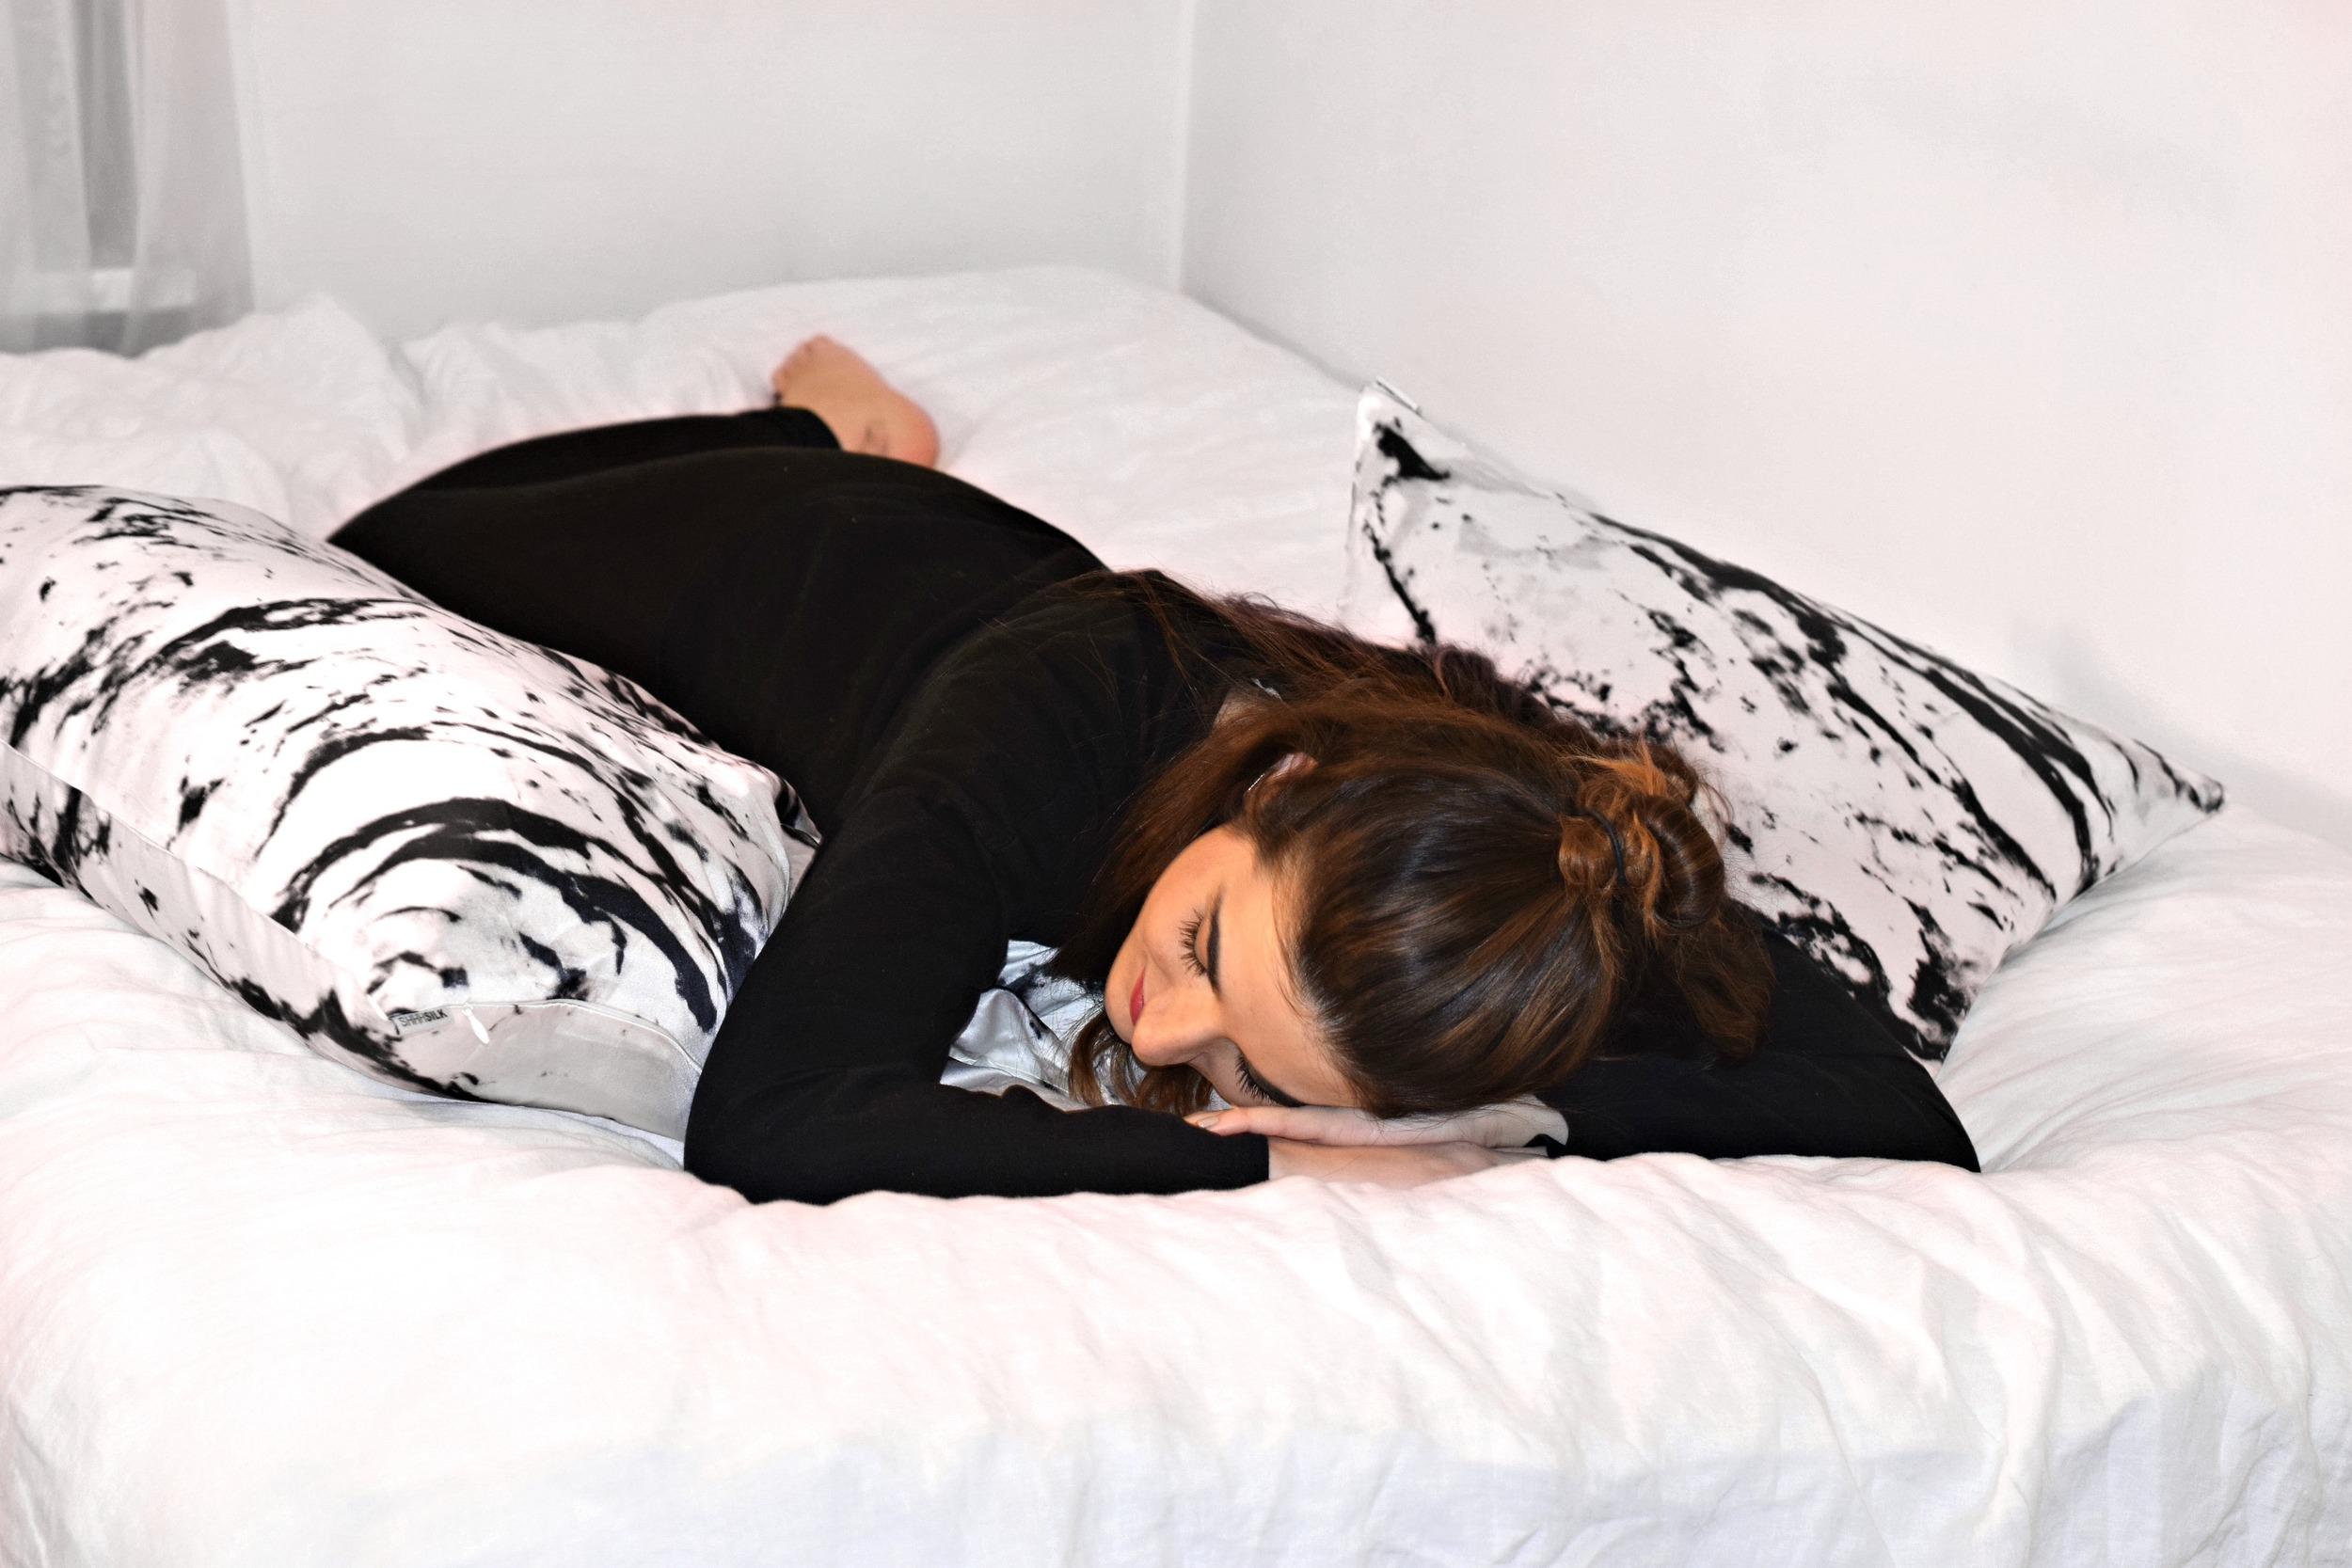 Marble Pillowcases Shhh Silk Louboutins & Love Fashion Blog Esther Santer NYC Street Style Blogger Black Outfit Bed Photoshoot Girl Women White Inspo Inspiration Trendy Wear Shop Topknot Buy Bedding Australia New York City Bedroom Pretty Need Shirt.jpg